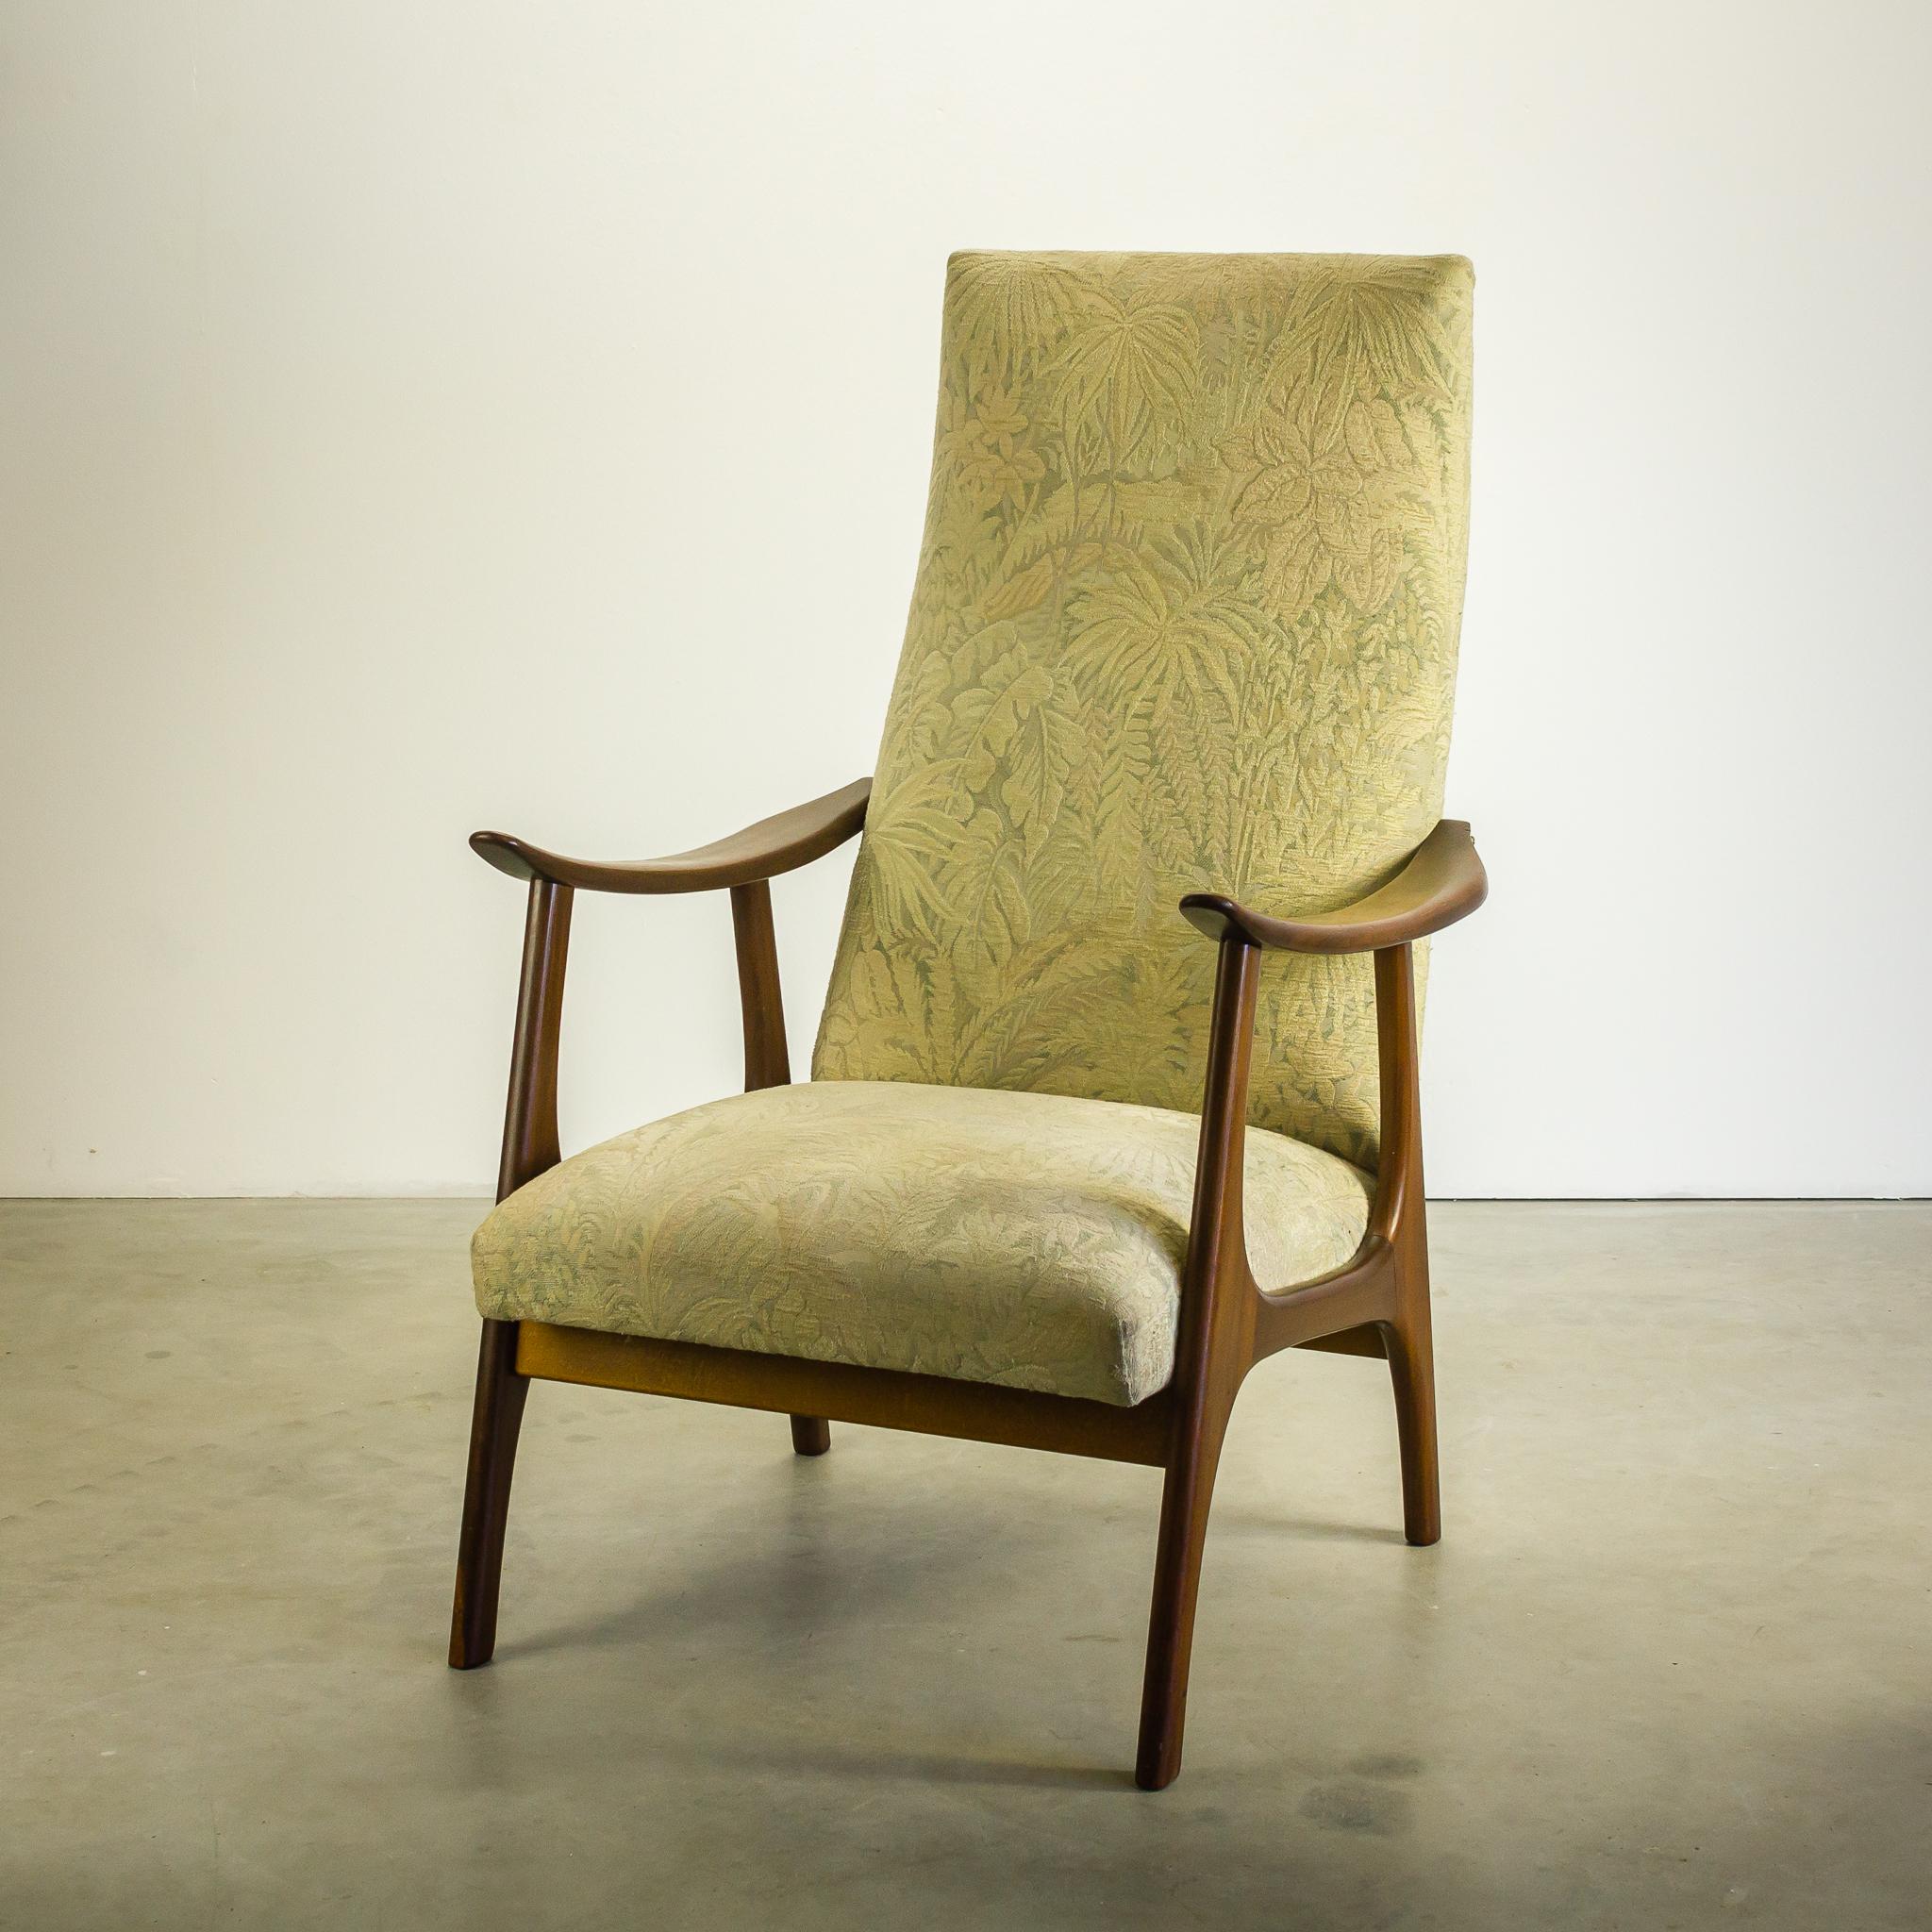 60 s webe teeffelen stijl teak fauteuil barbmama. Black Bedroom Furniture Sets. Home Design Ideas